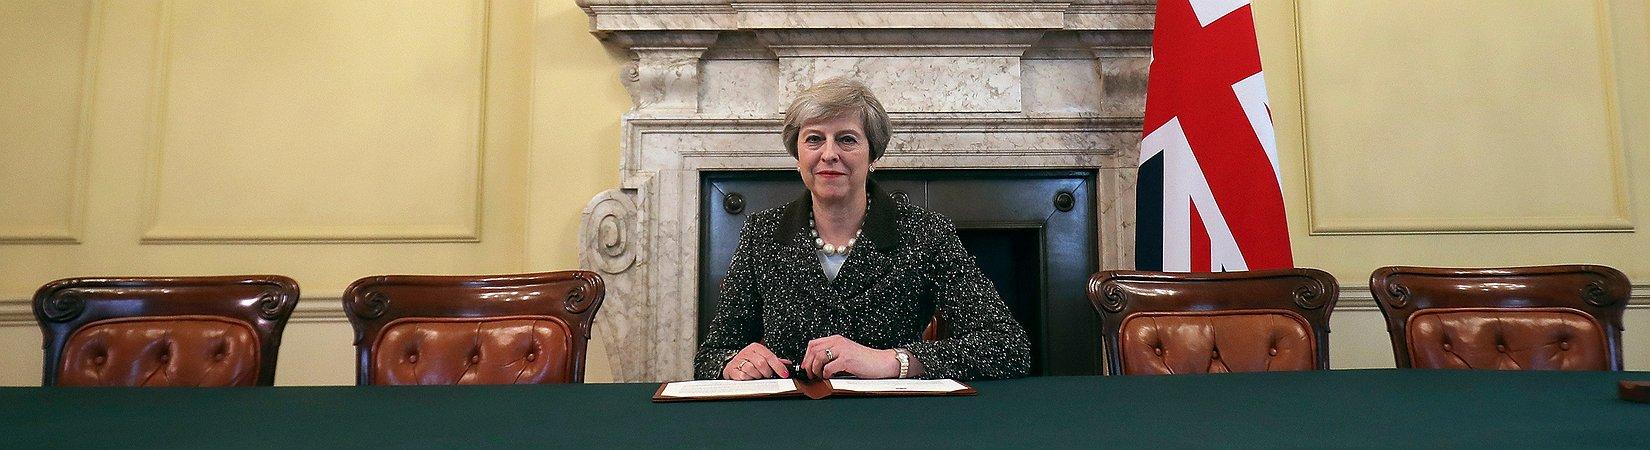 Theresa May assinou carta para dar início ao Brexit